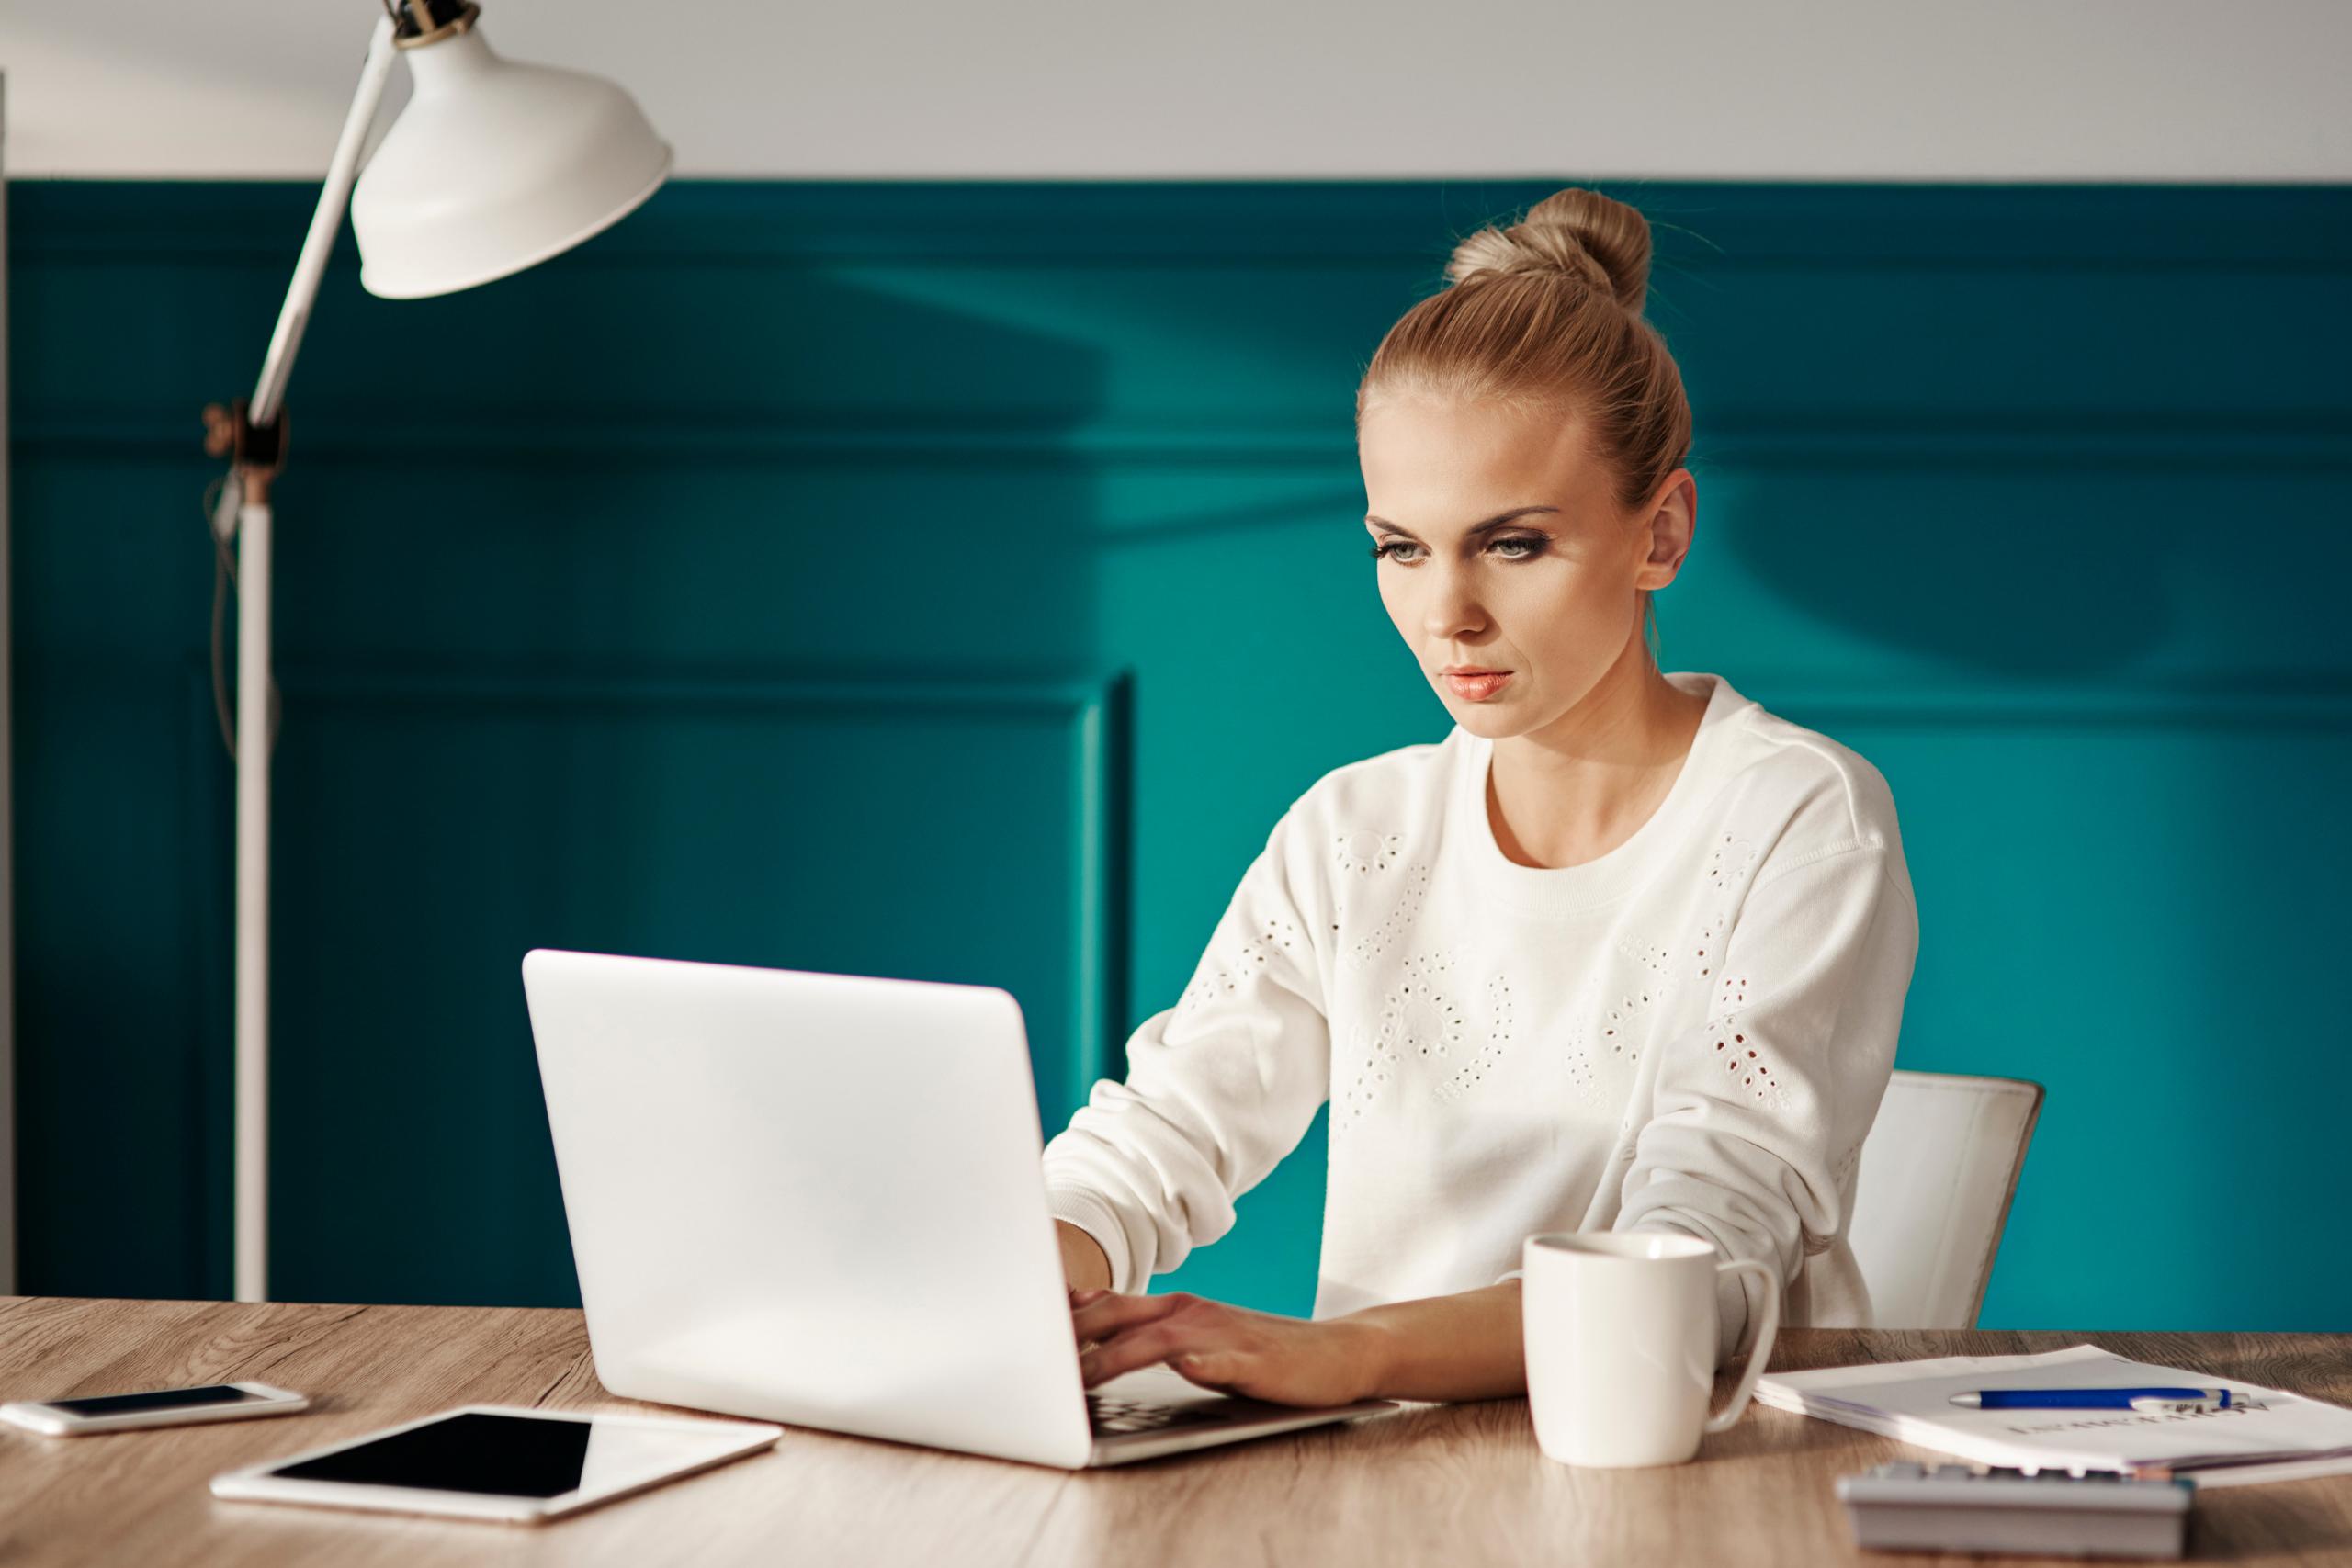 psychologische online beratung chat email